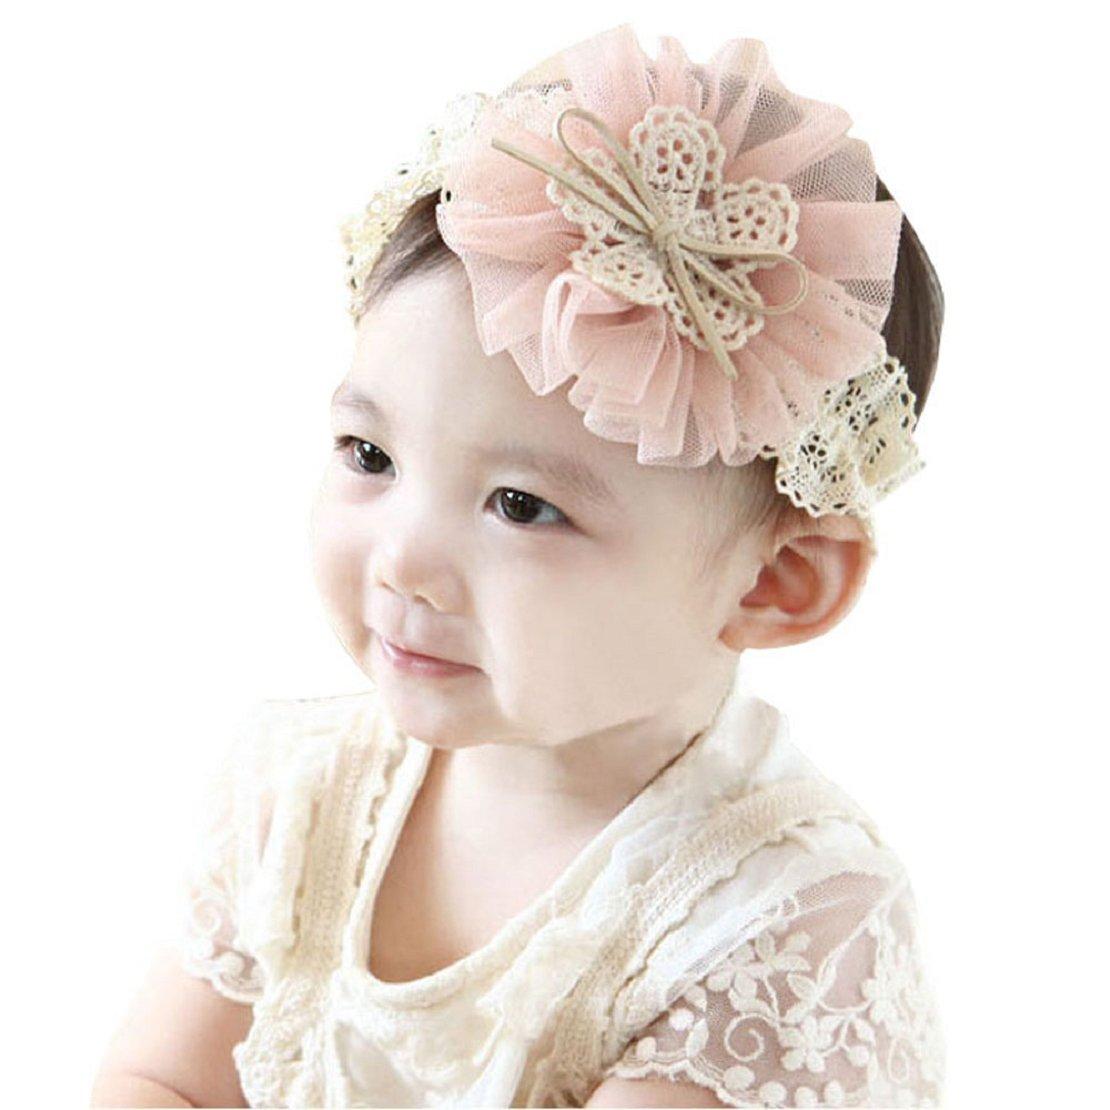 Baby Toddler Girls Kids Infant 2 Star Cotton Soft Headband Hairwear Hairband